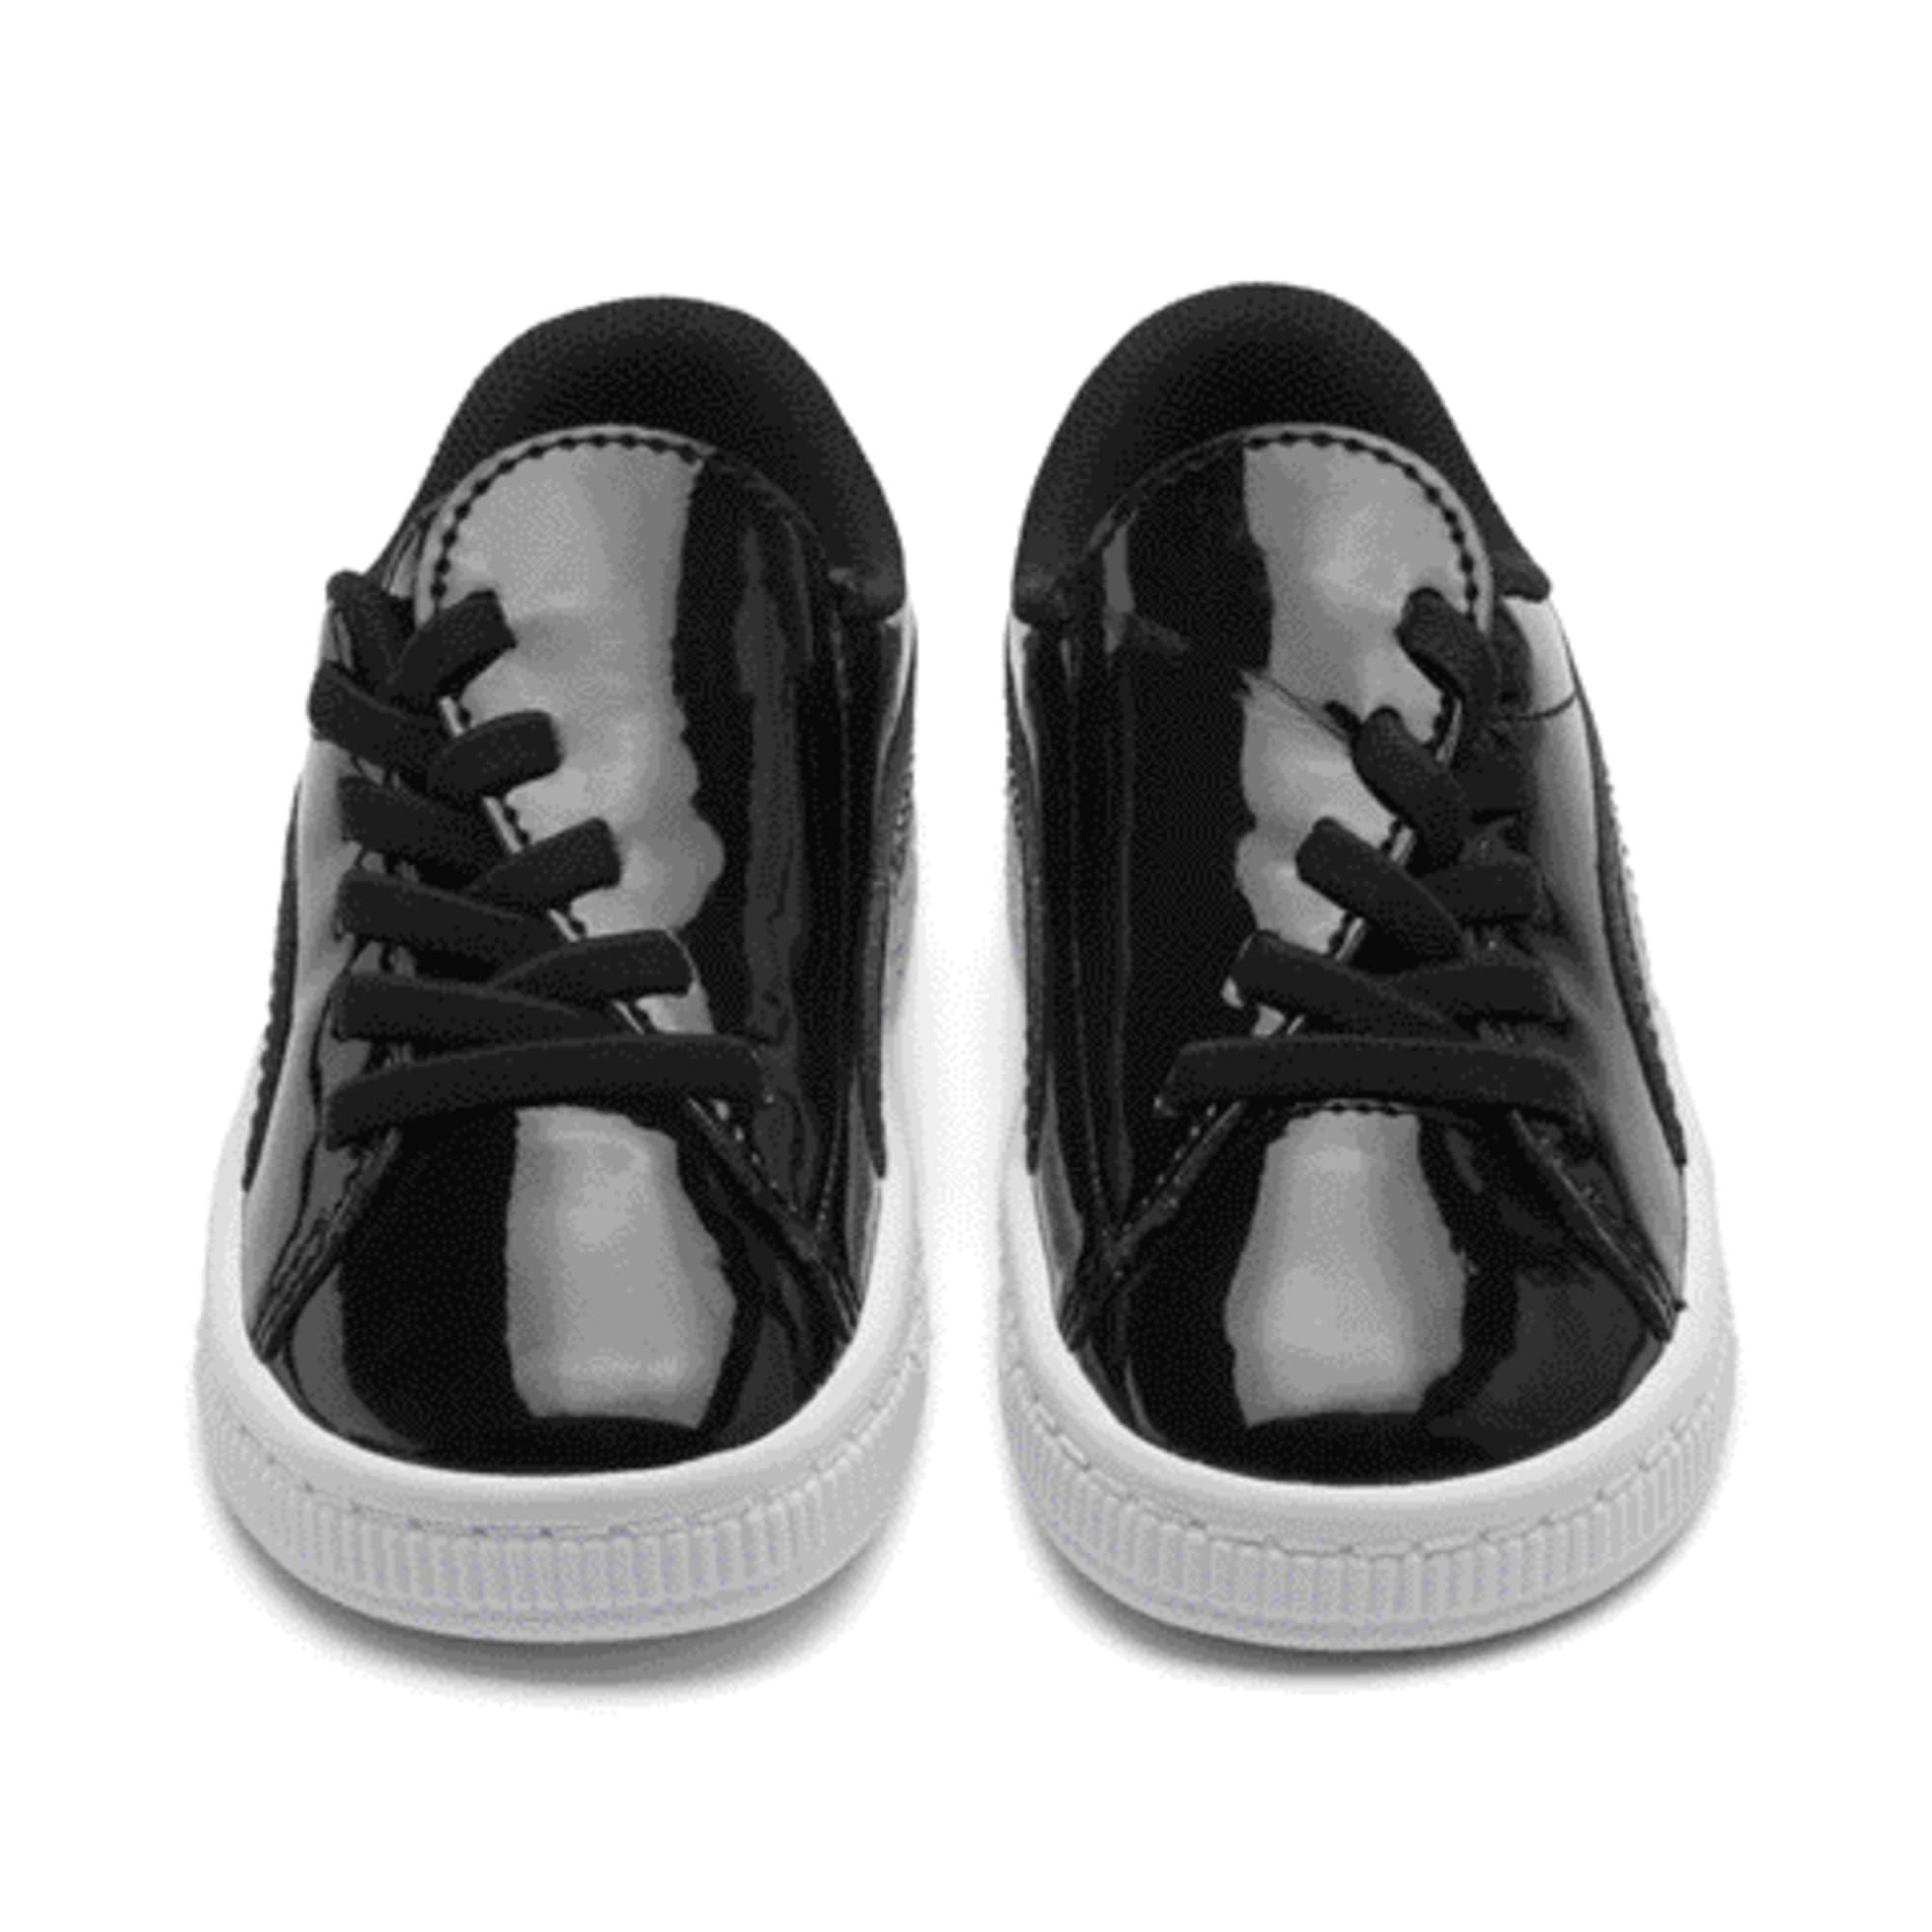 Thumbnail 2 of Basket Crush Patent AC Toddler Shoes, Puma Black-Puma White, medium